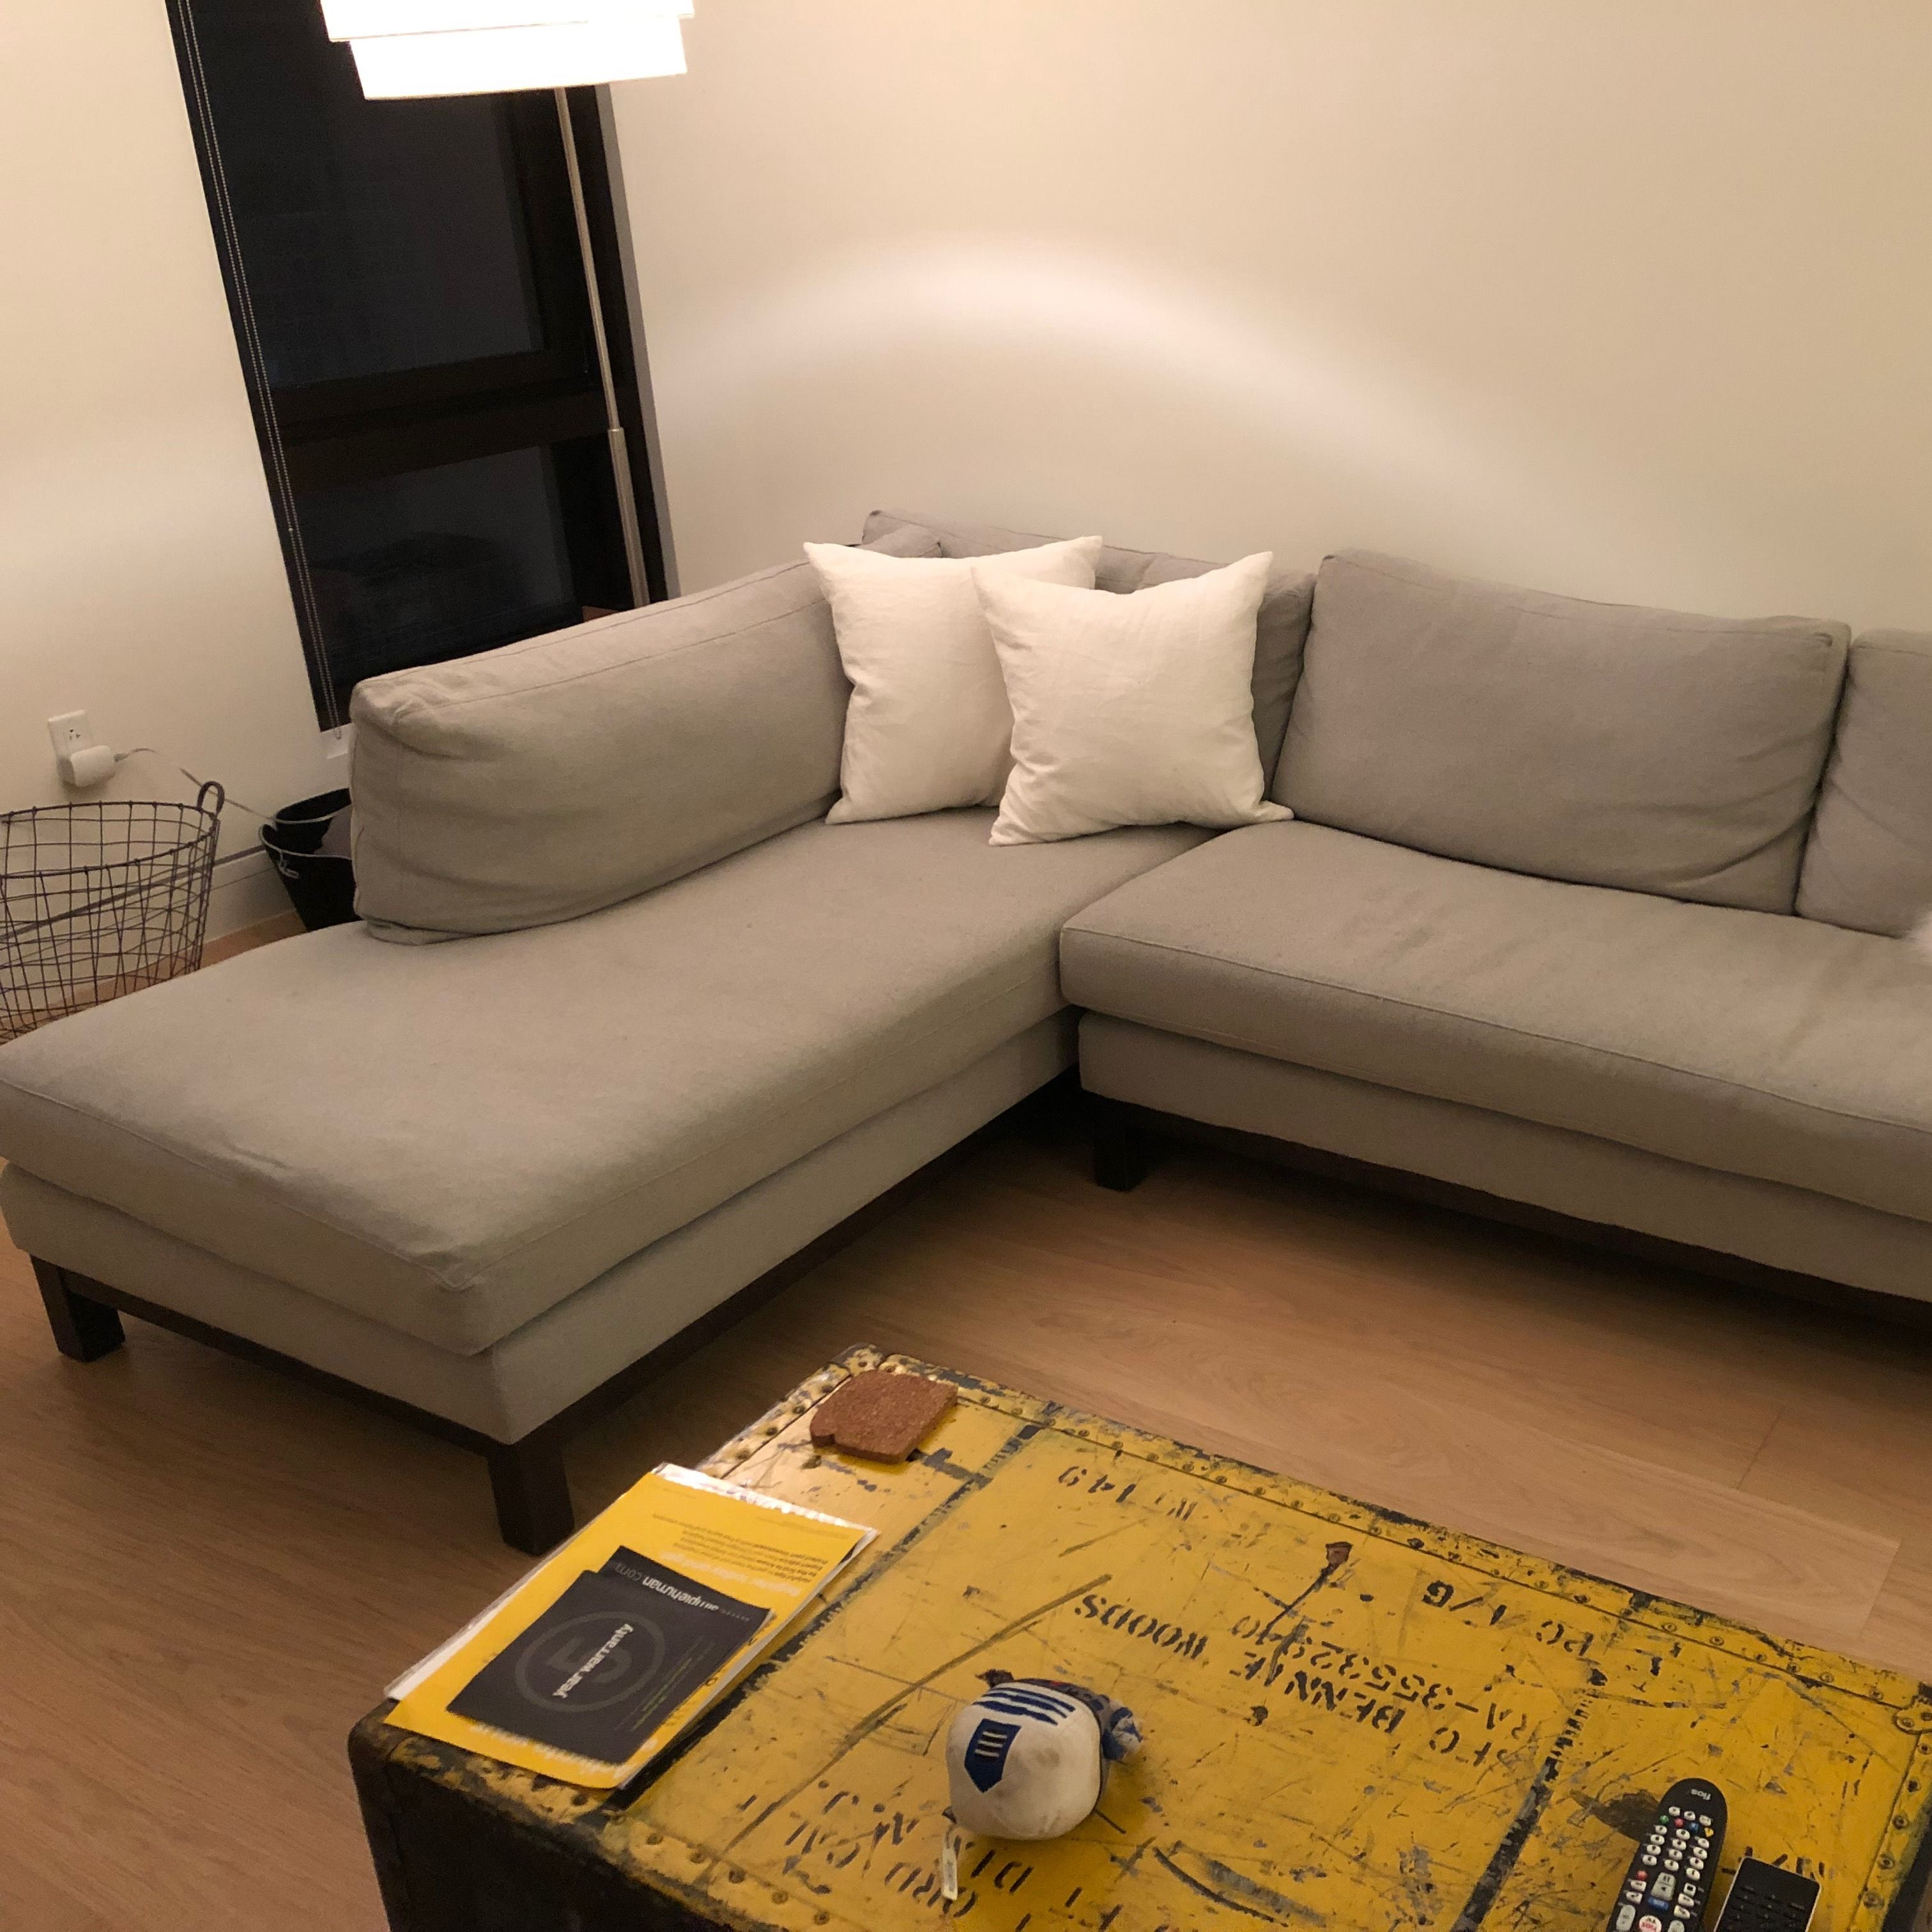 Enjoyable Abc Home Cobble Hill Prescott Sectional Sofa Cjindustries Chair Design For Home Cjindustriesco